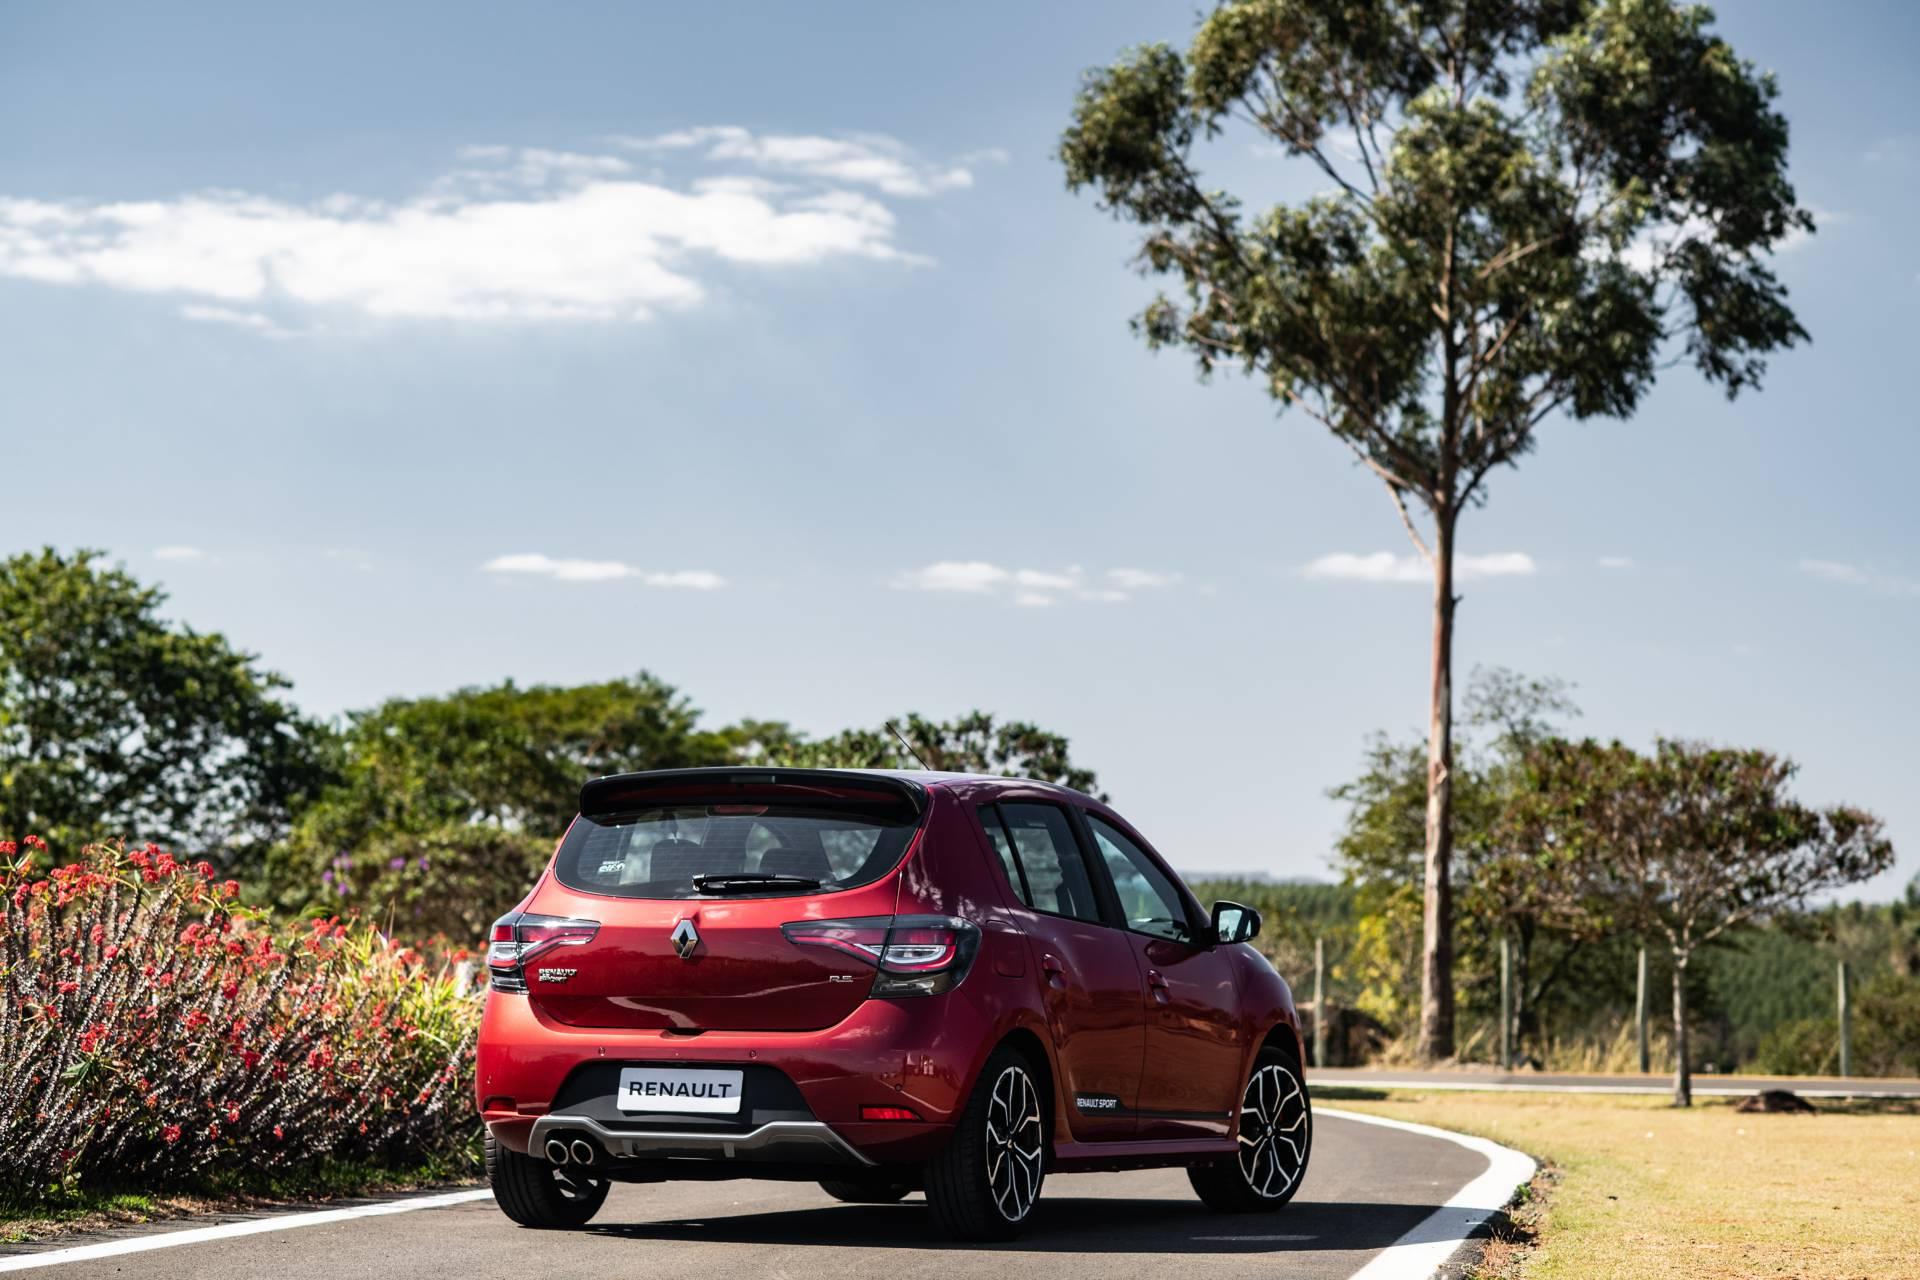 2020_Renault_Sandero_RS_facelift_0026